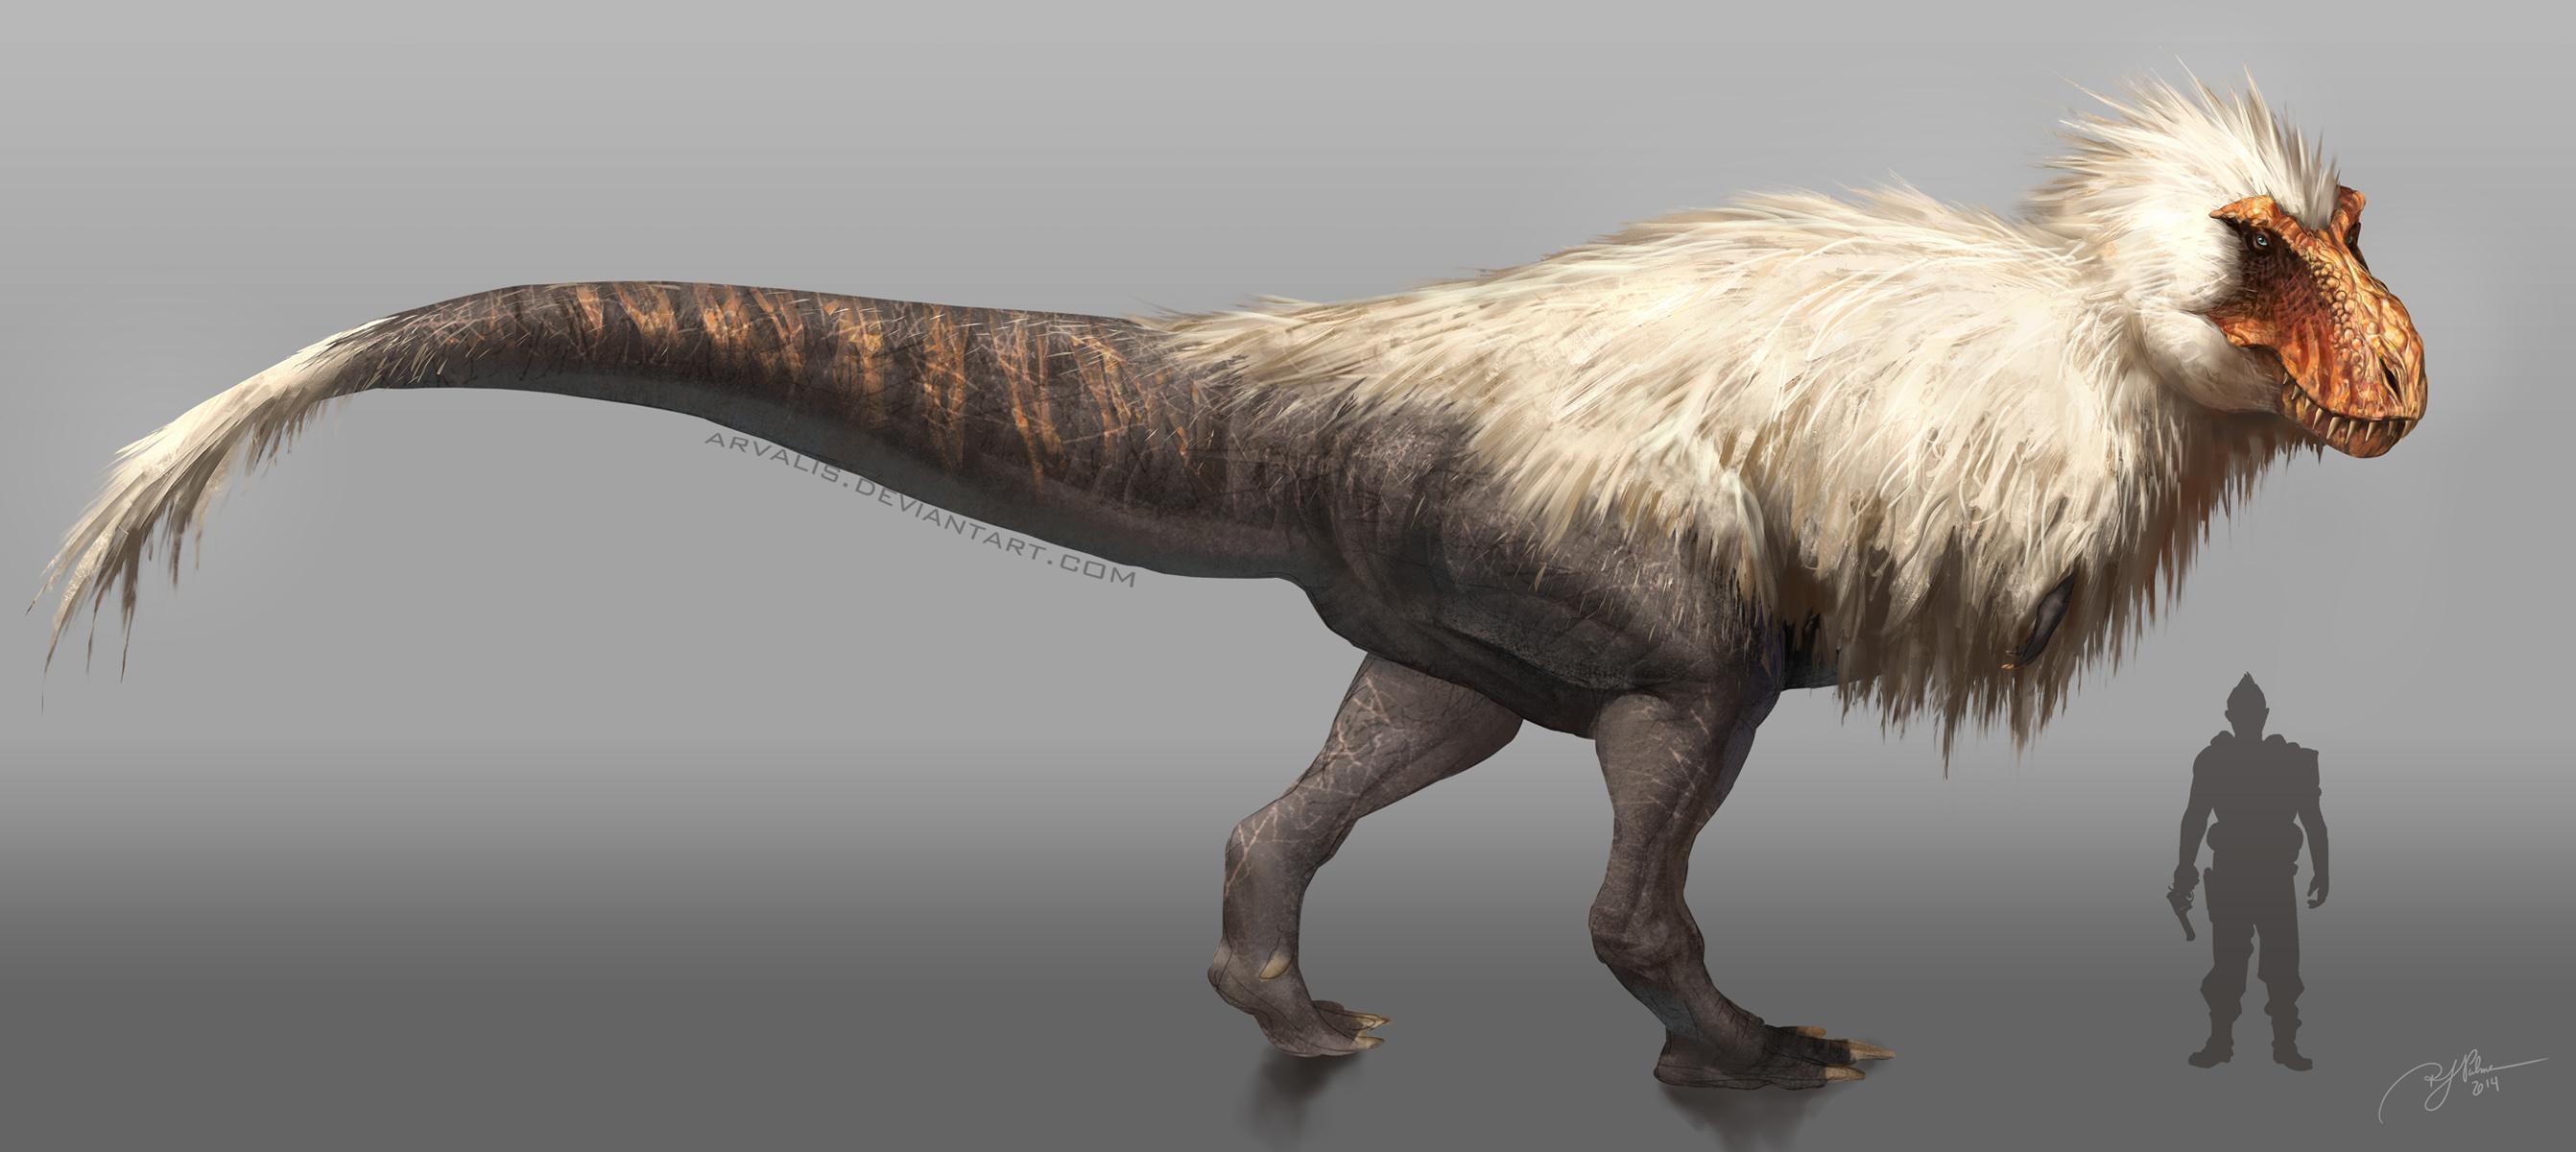 Fluffy rex by arvalis on deviantart for Tyranosaurus rex